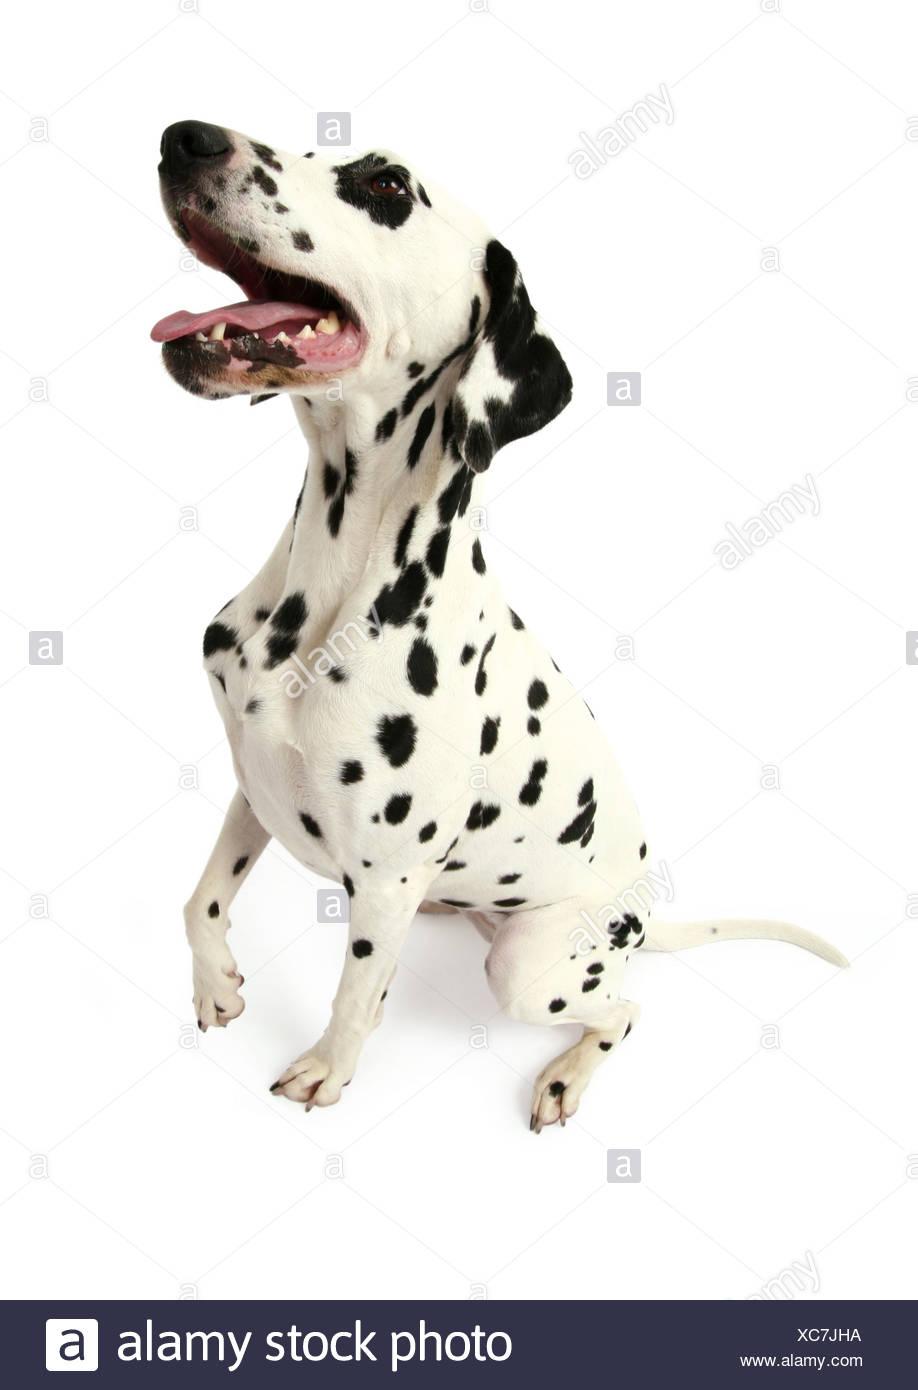 Dalmatian (Canis lupus f. familiaris), Dalmatian panting and waiting for something - Stock Image